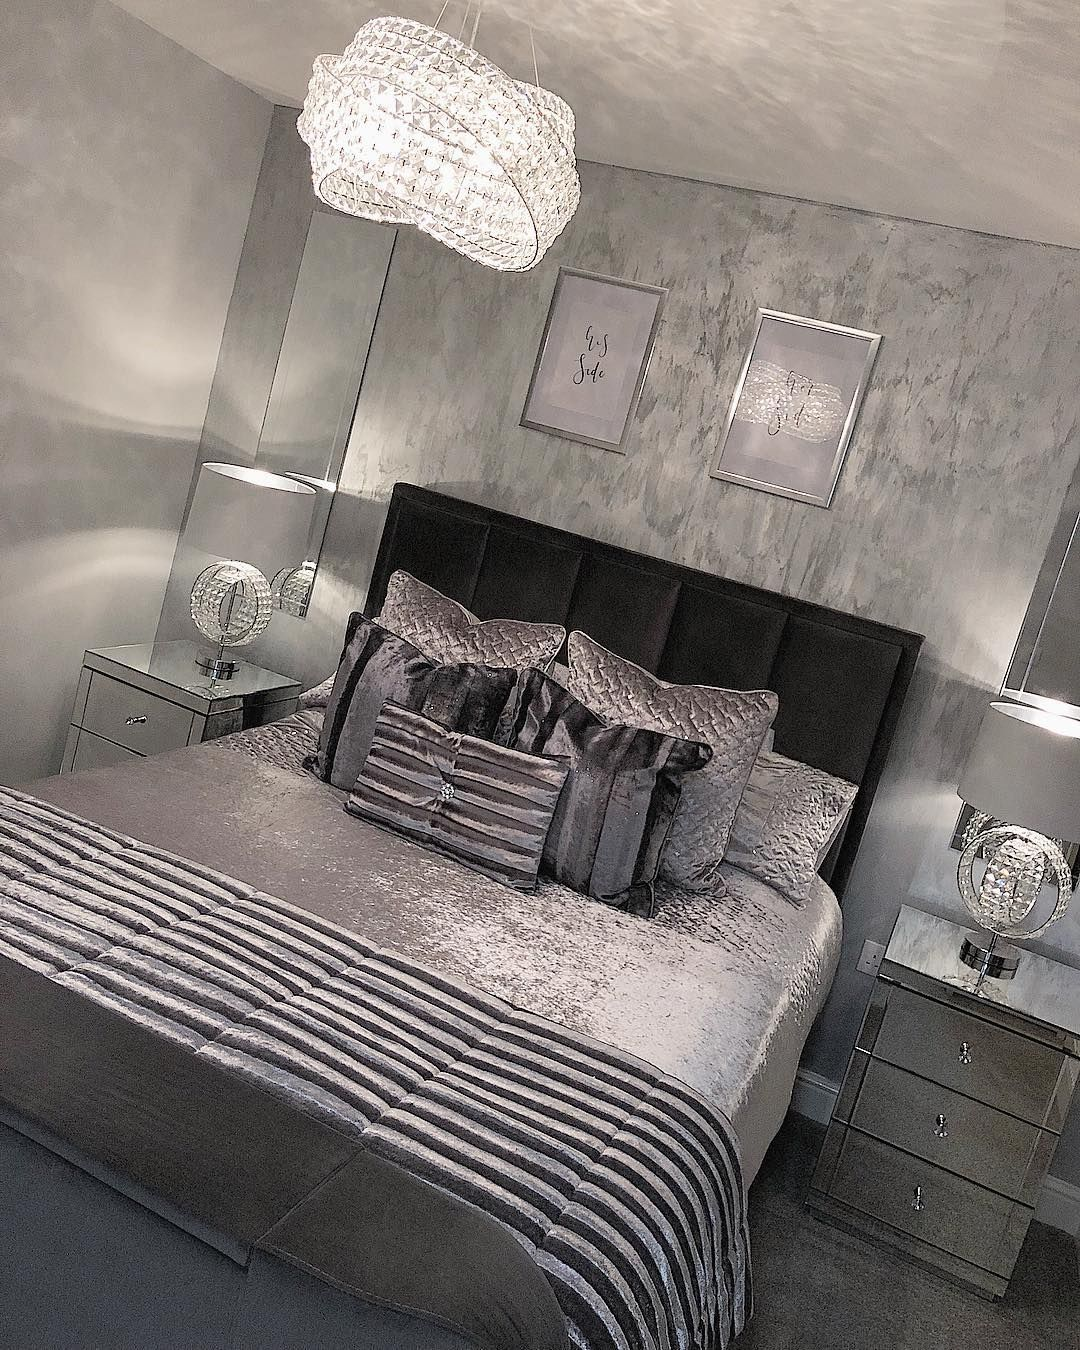 50 shades of gray | Bed, Bedroom decor, Decor